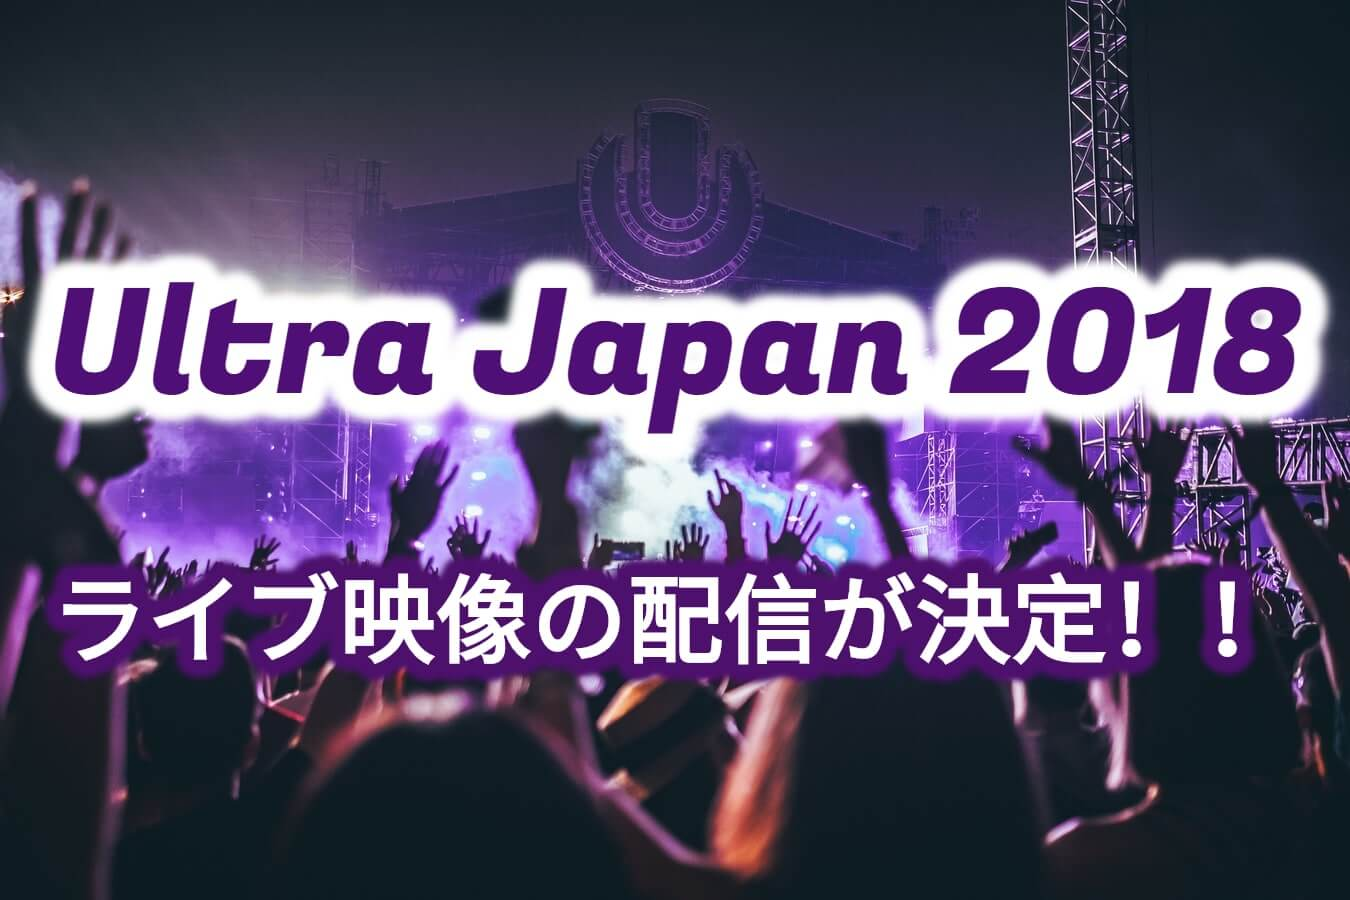 Ultra Japan 2018のライブ映像の配信が決定!行けない方必見です!!